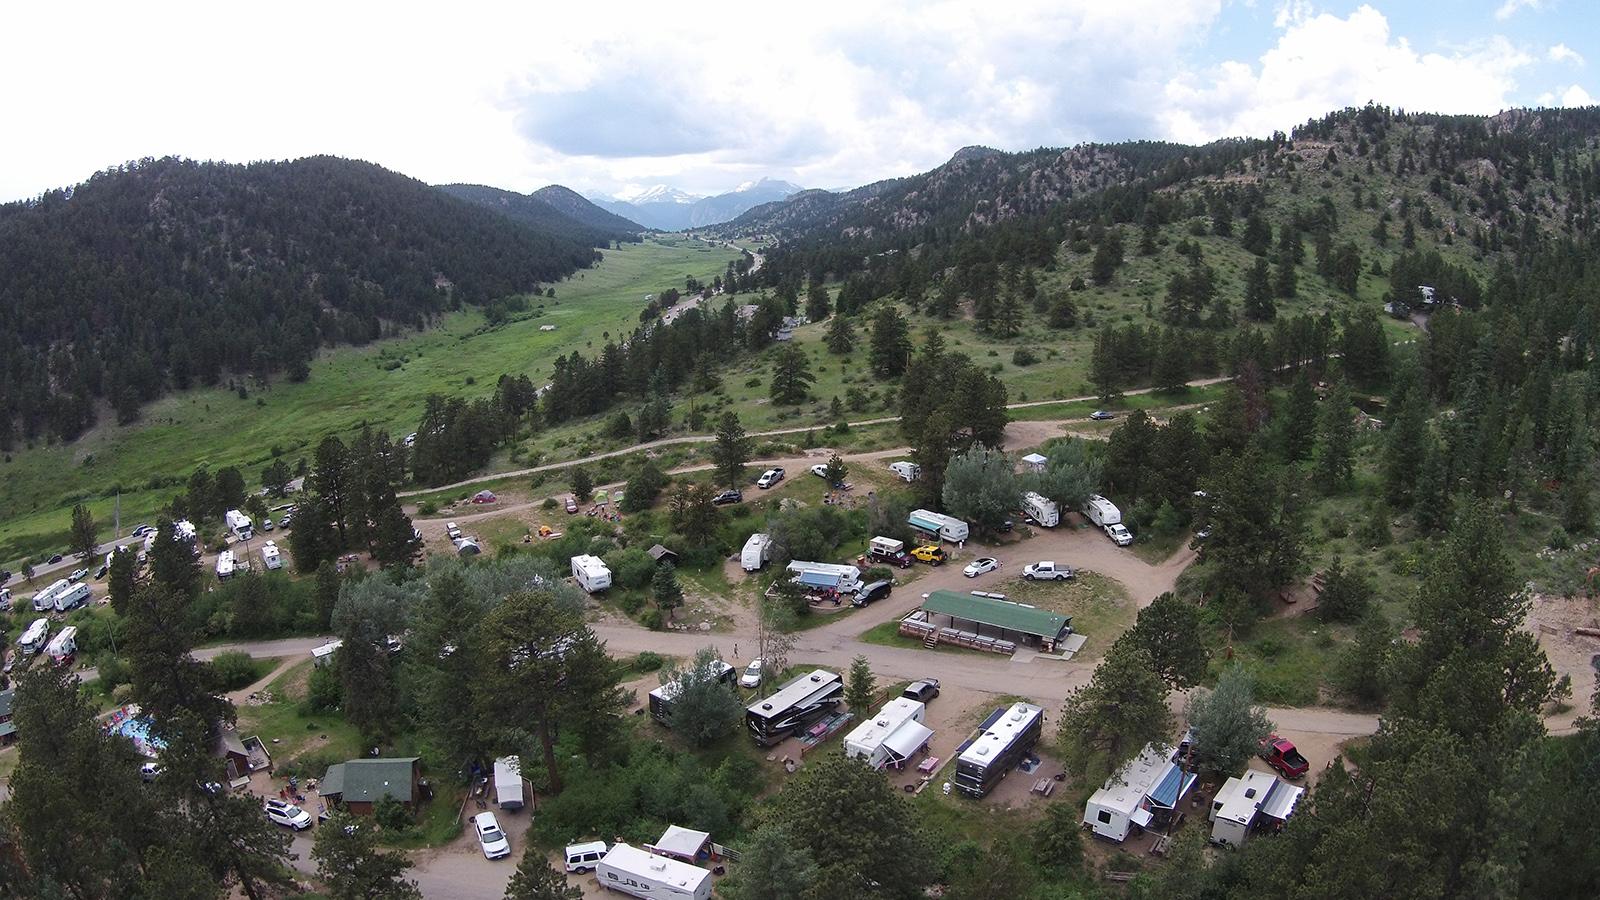 Estes Park Campground Estes Park Camping Jellystone Of